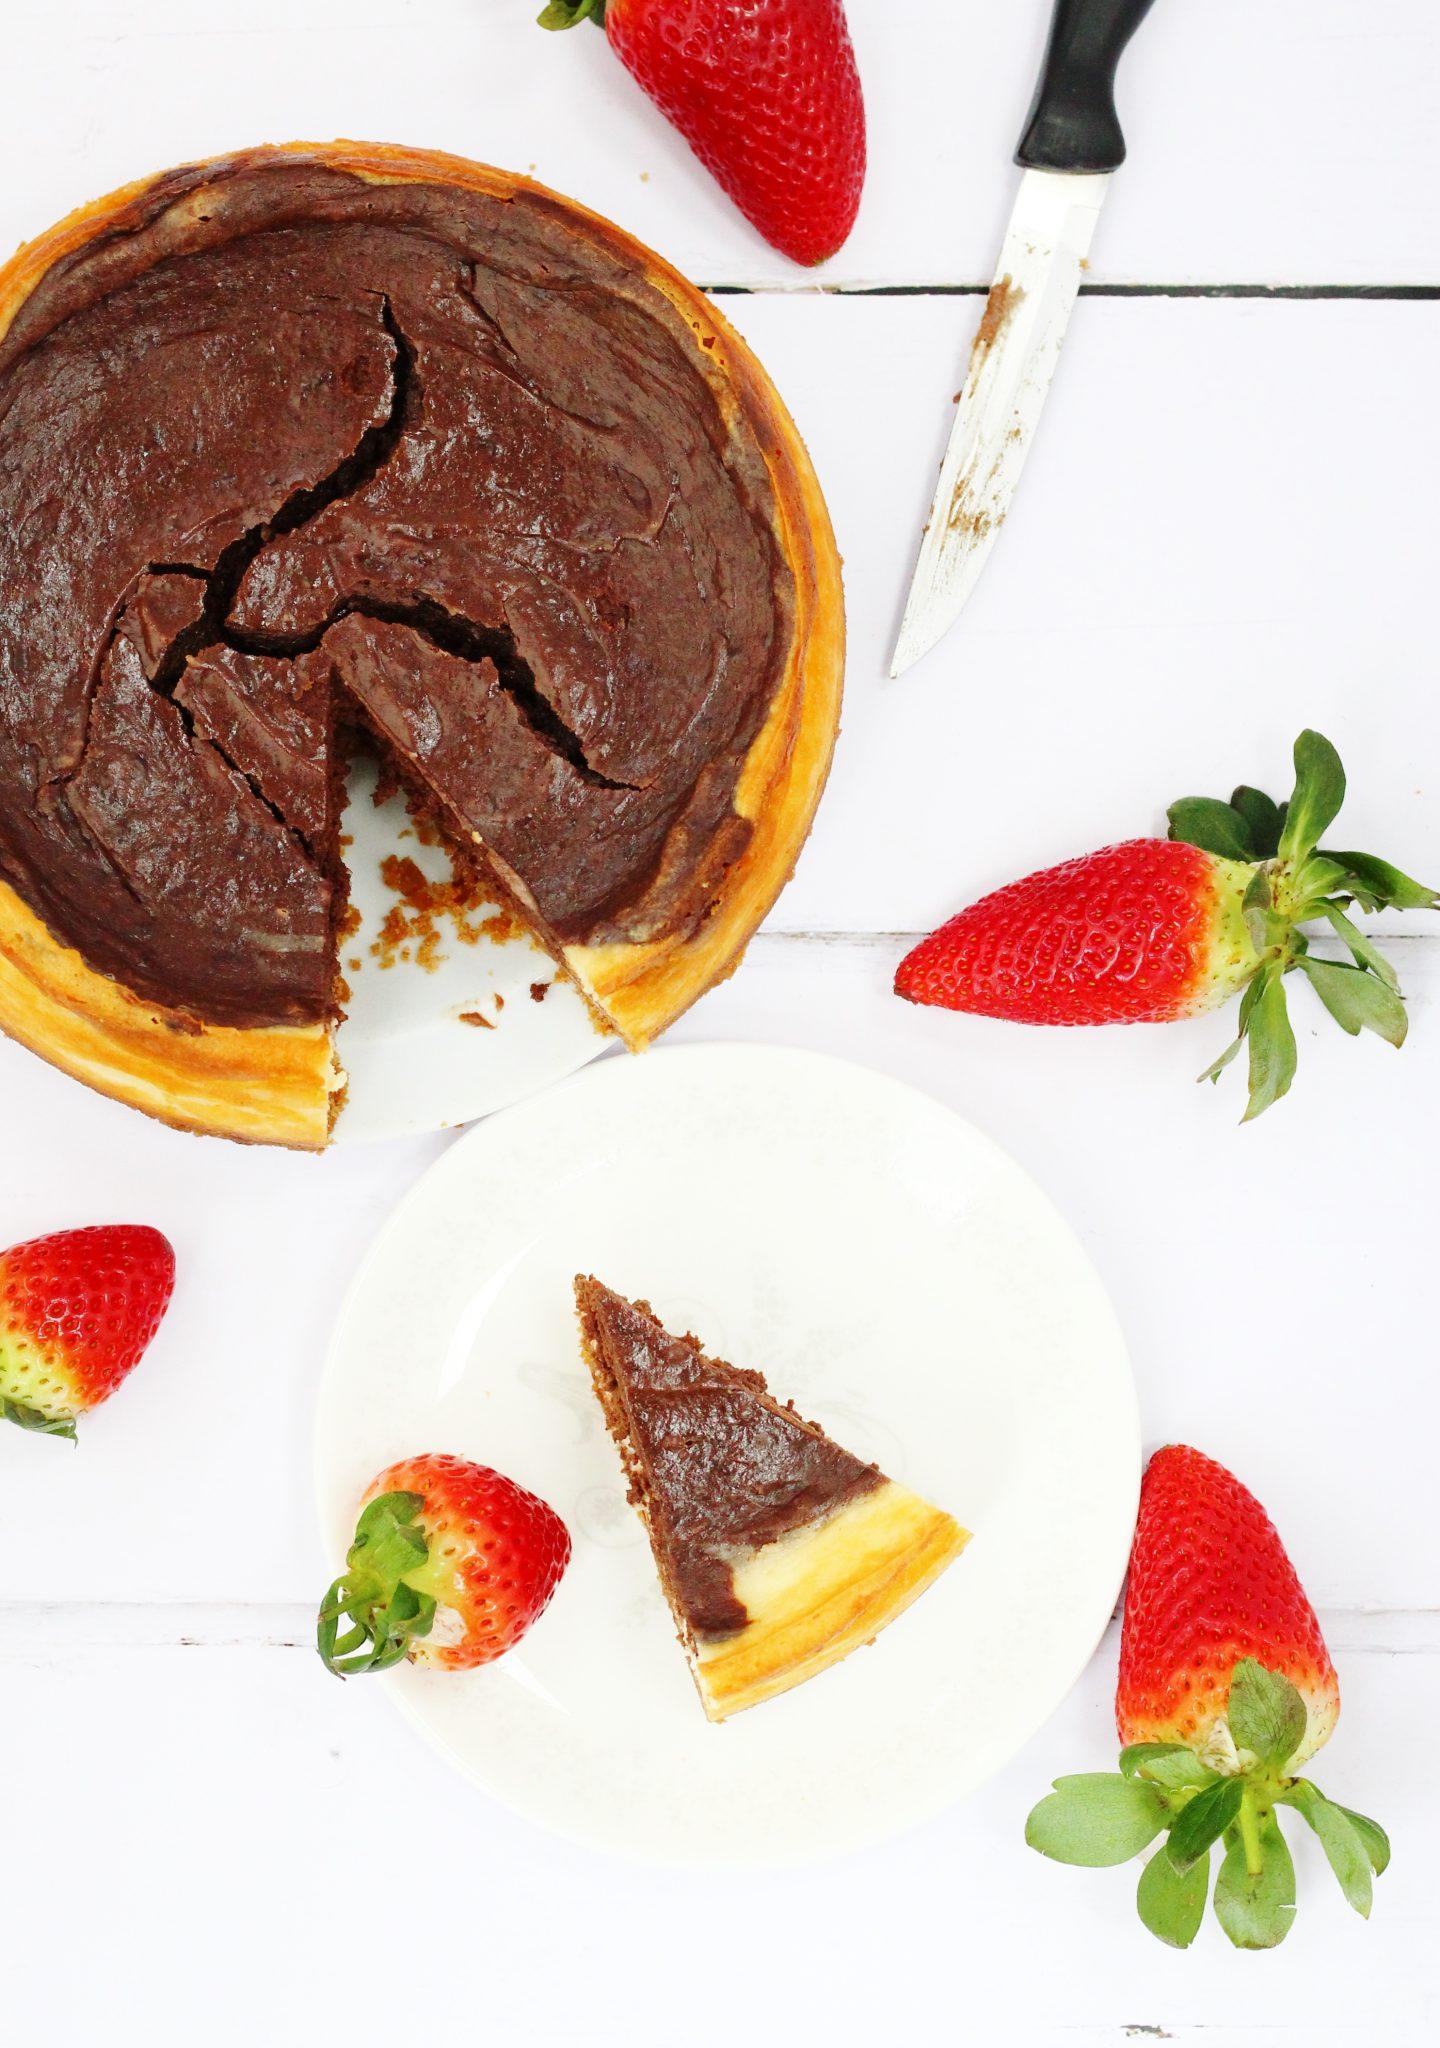 Mary Berry's American Style Chocolate cheesecake. Baked vanilla and chocolate cheesecake